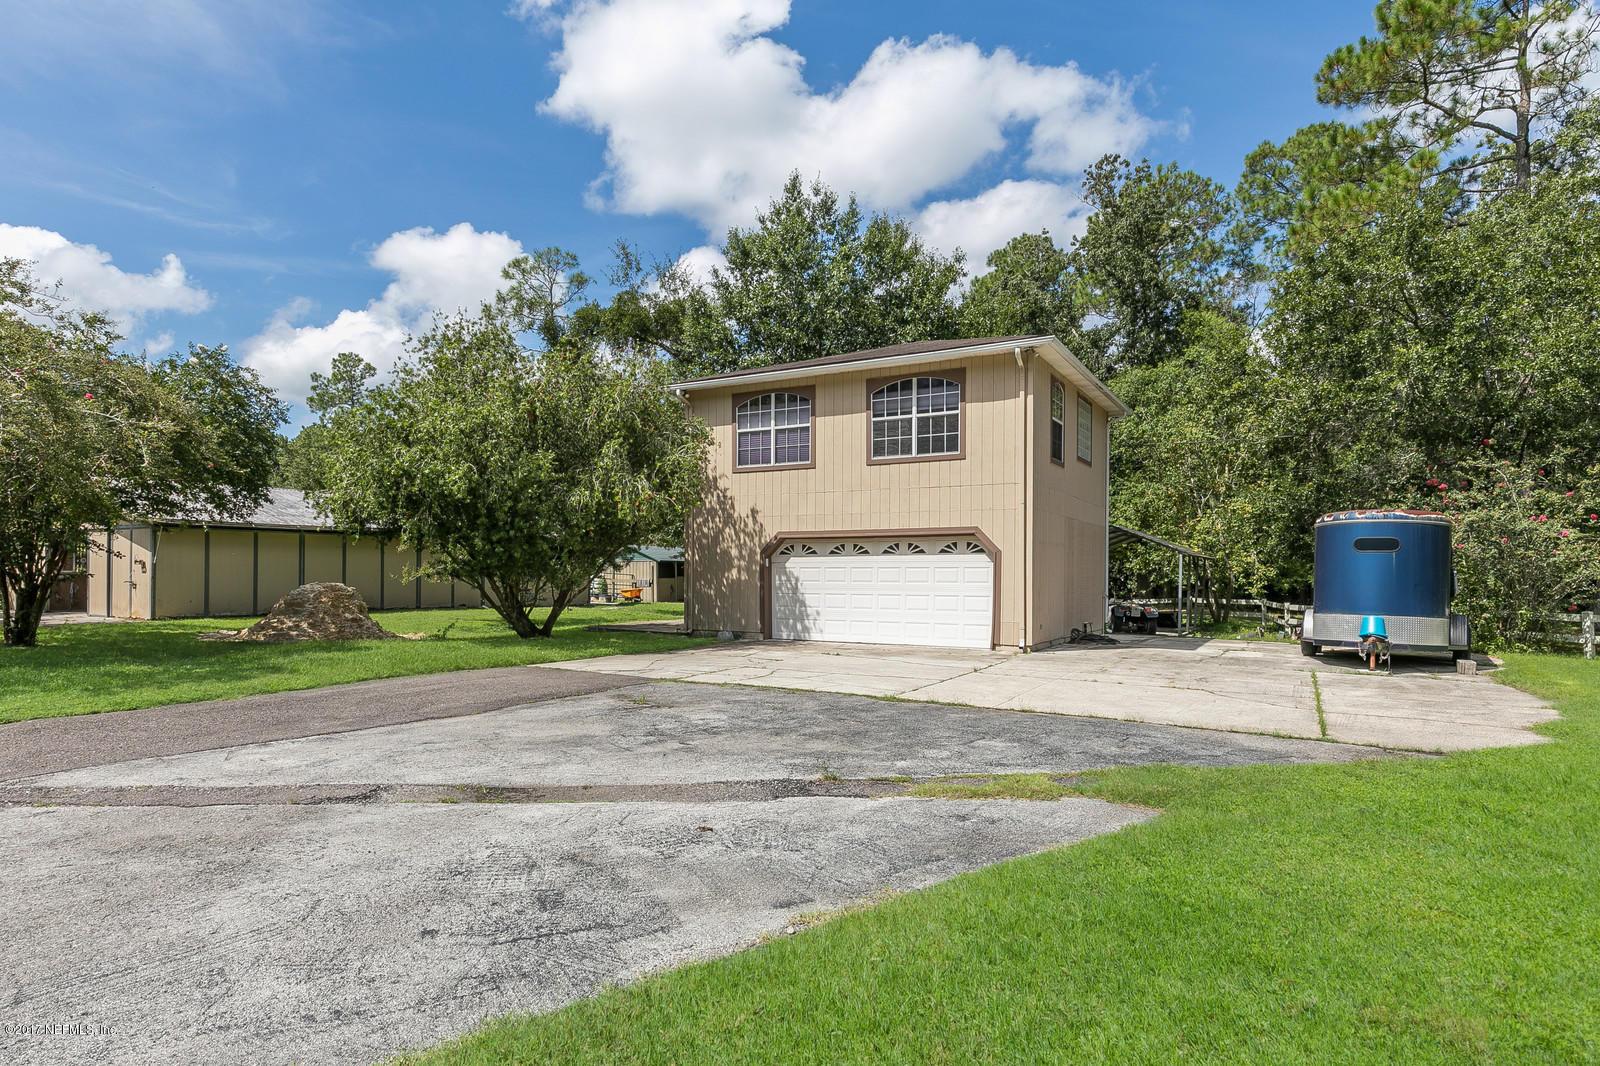 5476 TIERRA VERDE, JACKSONVILLE, FLORIDA 32258, 6 Bedrooms Bedrooms, ,4 BathroomsBathrooms,Residential - single family,For sale,TIERRA VERDE,899496